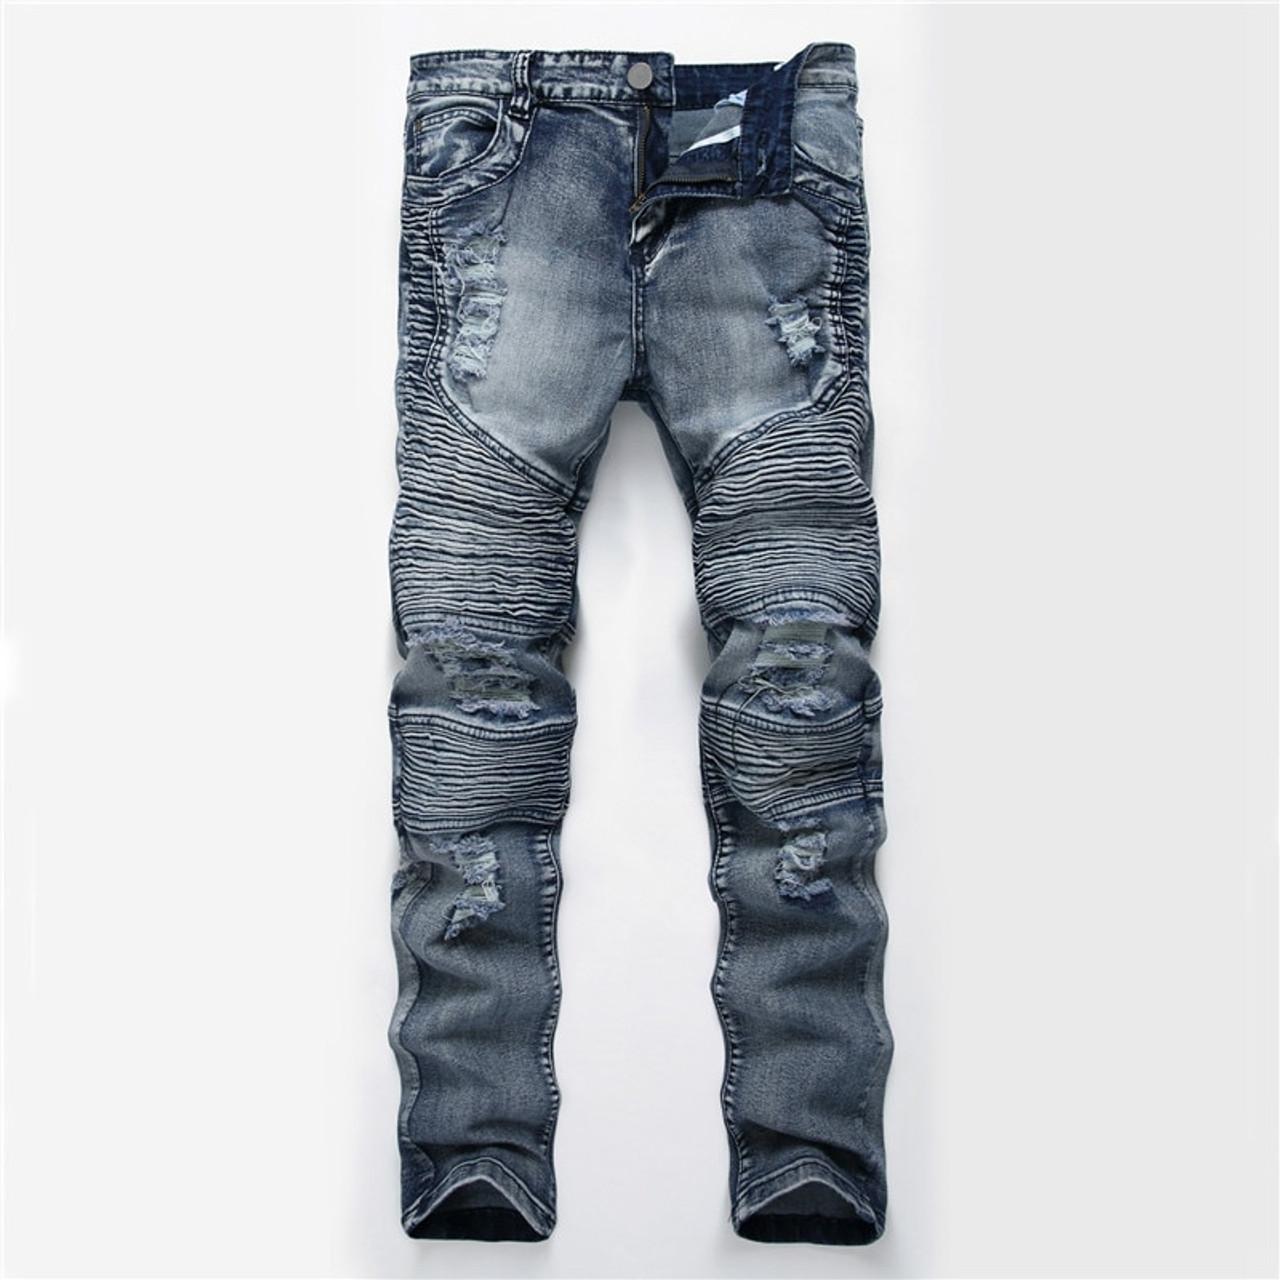 Dropshipping Men Washed Hole Ripped Biker Jeans New Jeans Men Fashion Casual Slim Fit Hip Hop High Street Holes Denim Pants Onshopdeals Com